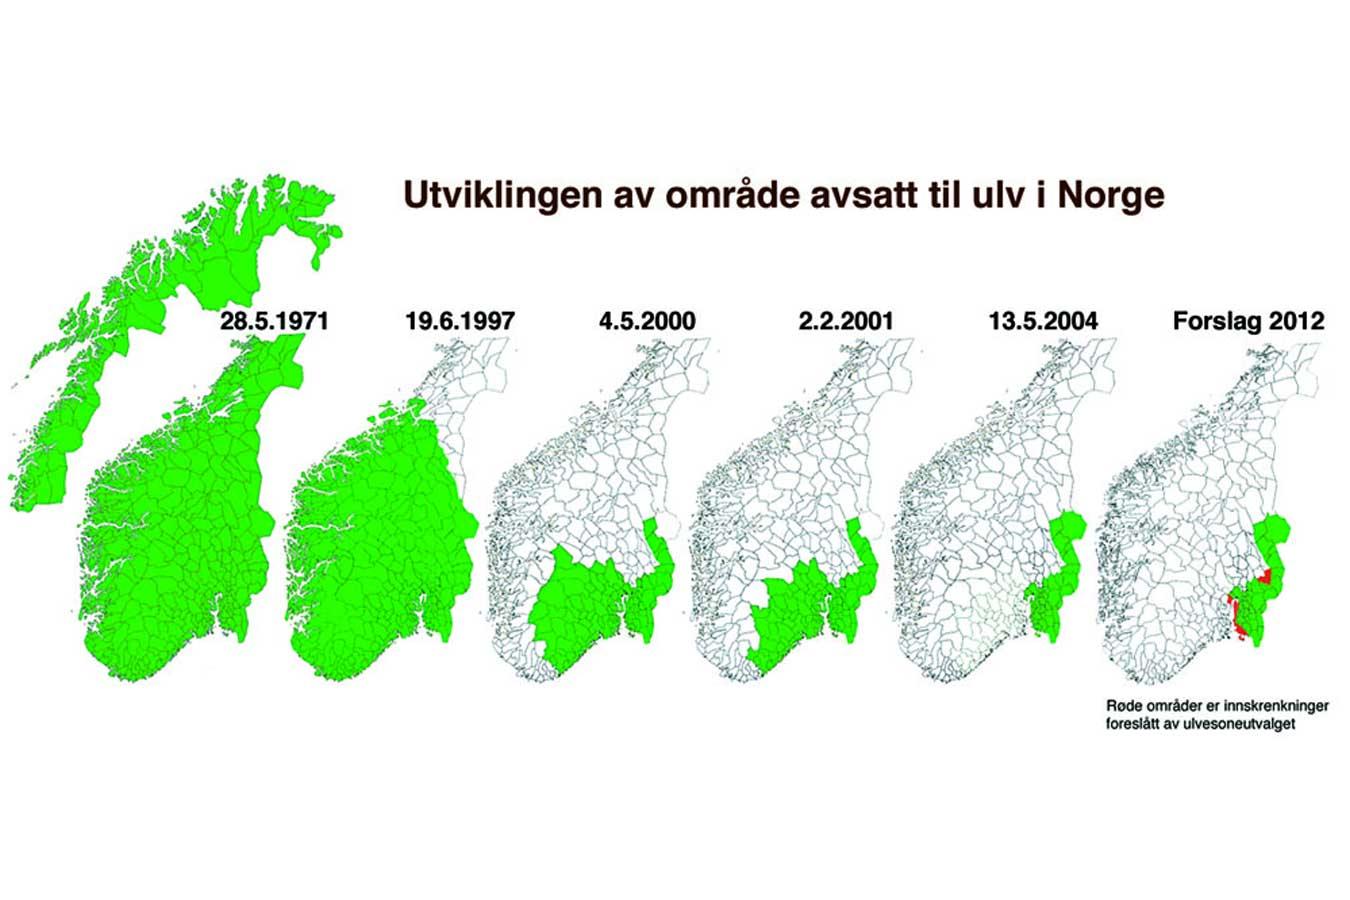 ulv i norge kart To ulver kan skytes utenfor ulvesonen | Fauna.no ulv i norge kart